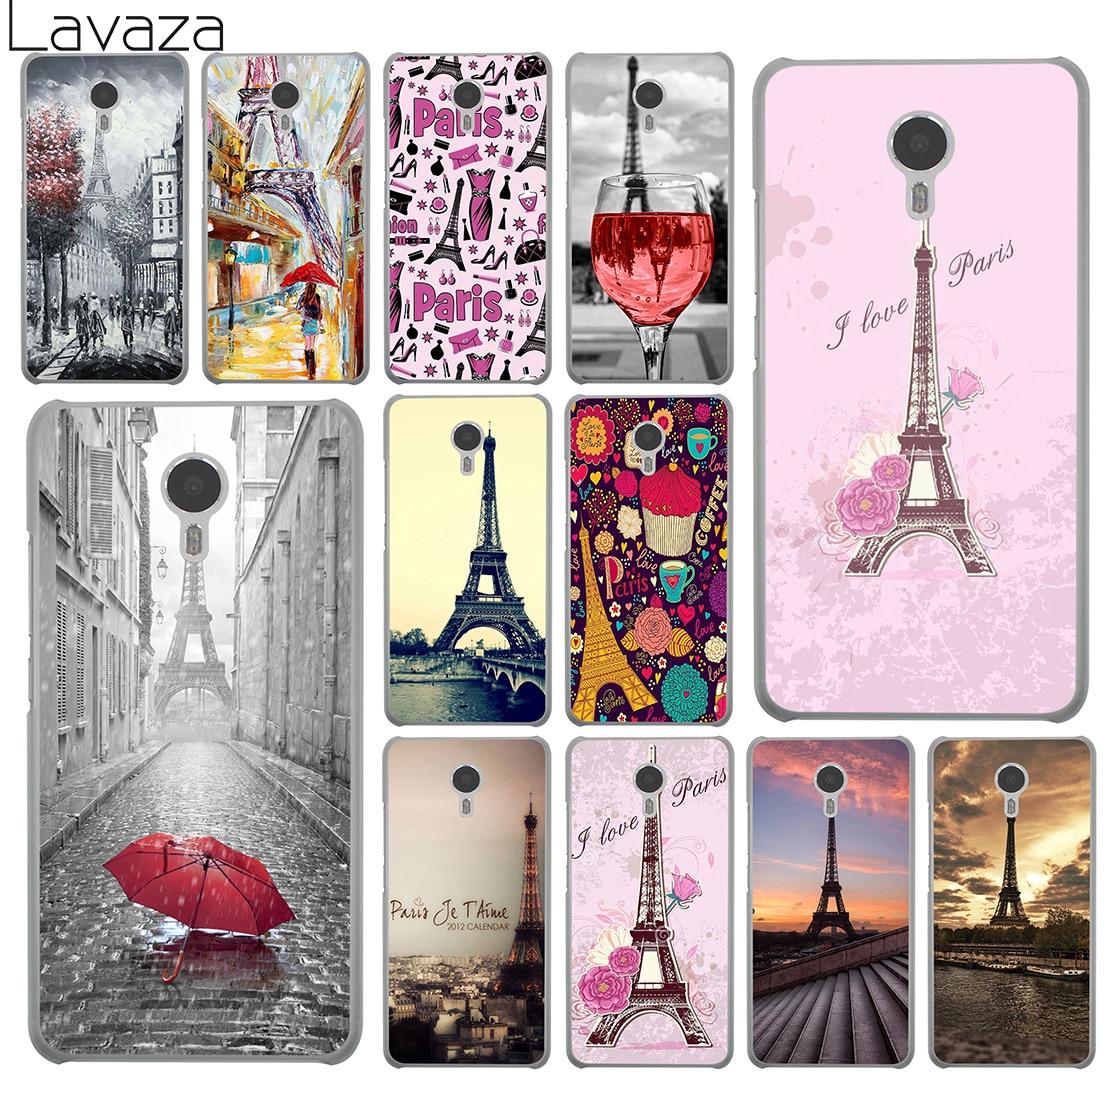 Lavaza Эйфелева башня Париж Любовь Розовый Жесткий телефон чехол для Meizu M6 M5 M5C M5S M3 M3S M2 мини примечание U10 U20 Pro 7 Plus 6 крышка